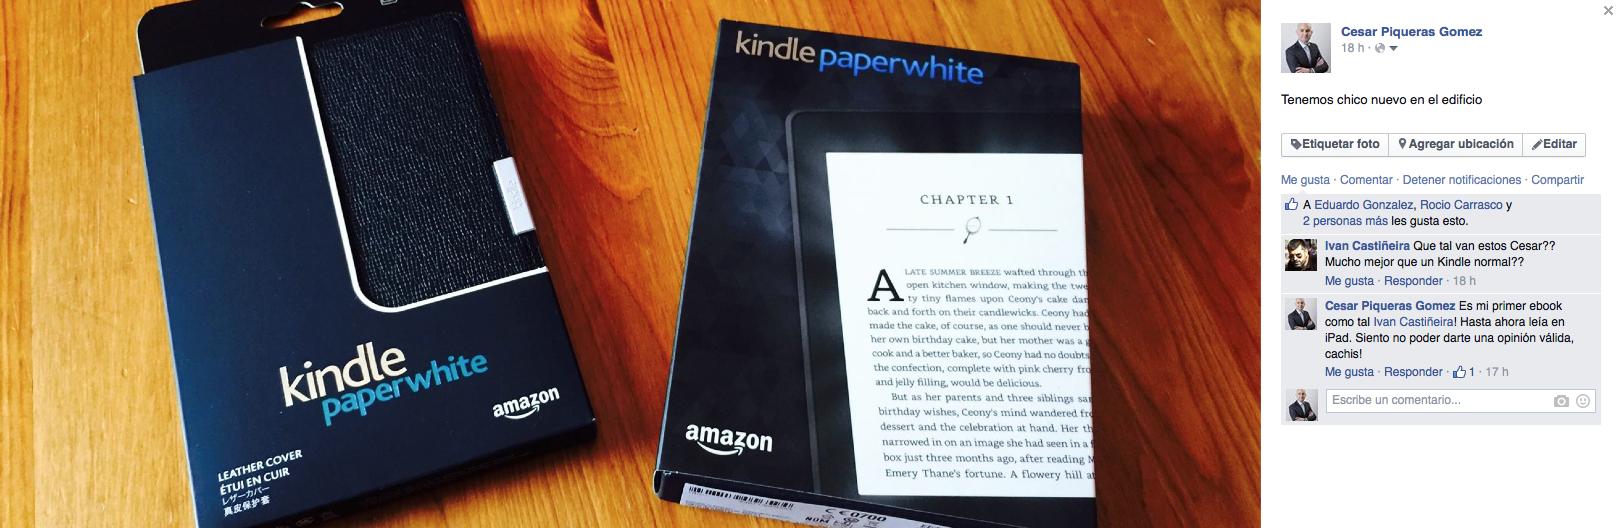 innovacion kindle paperwhite